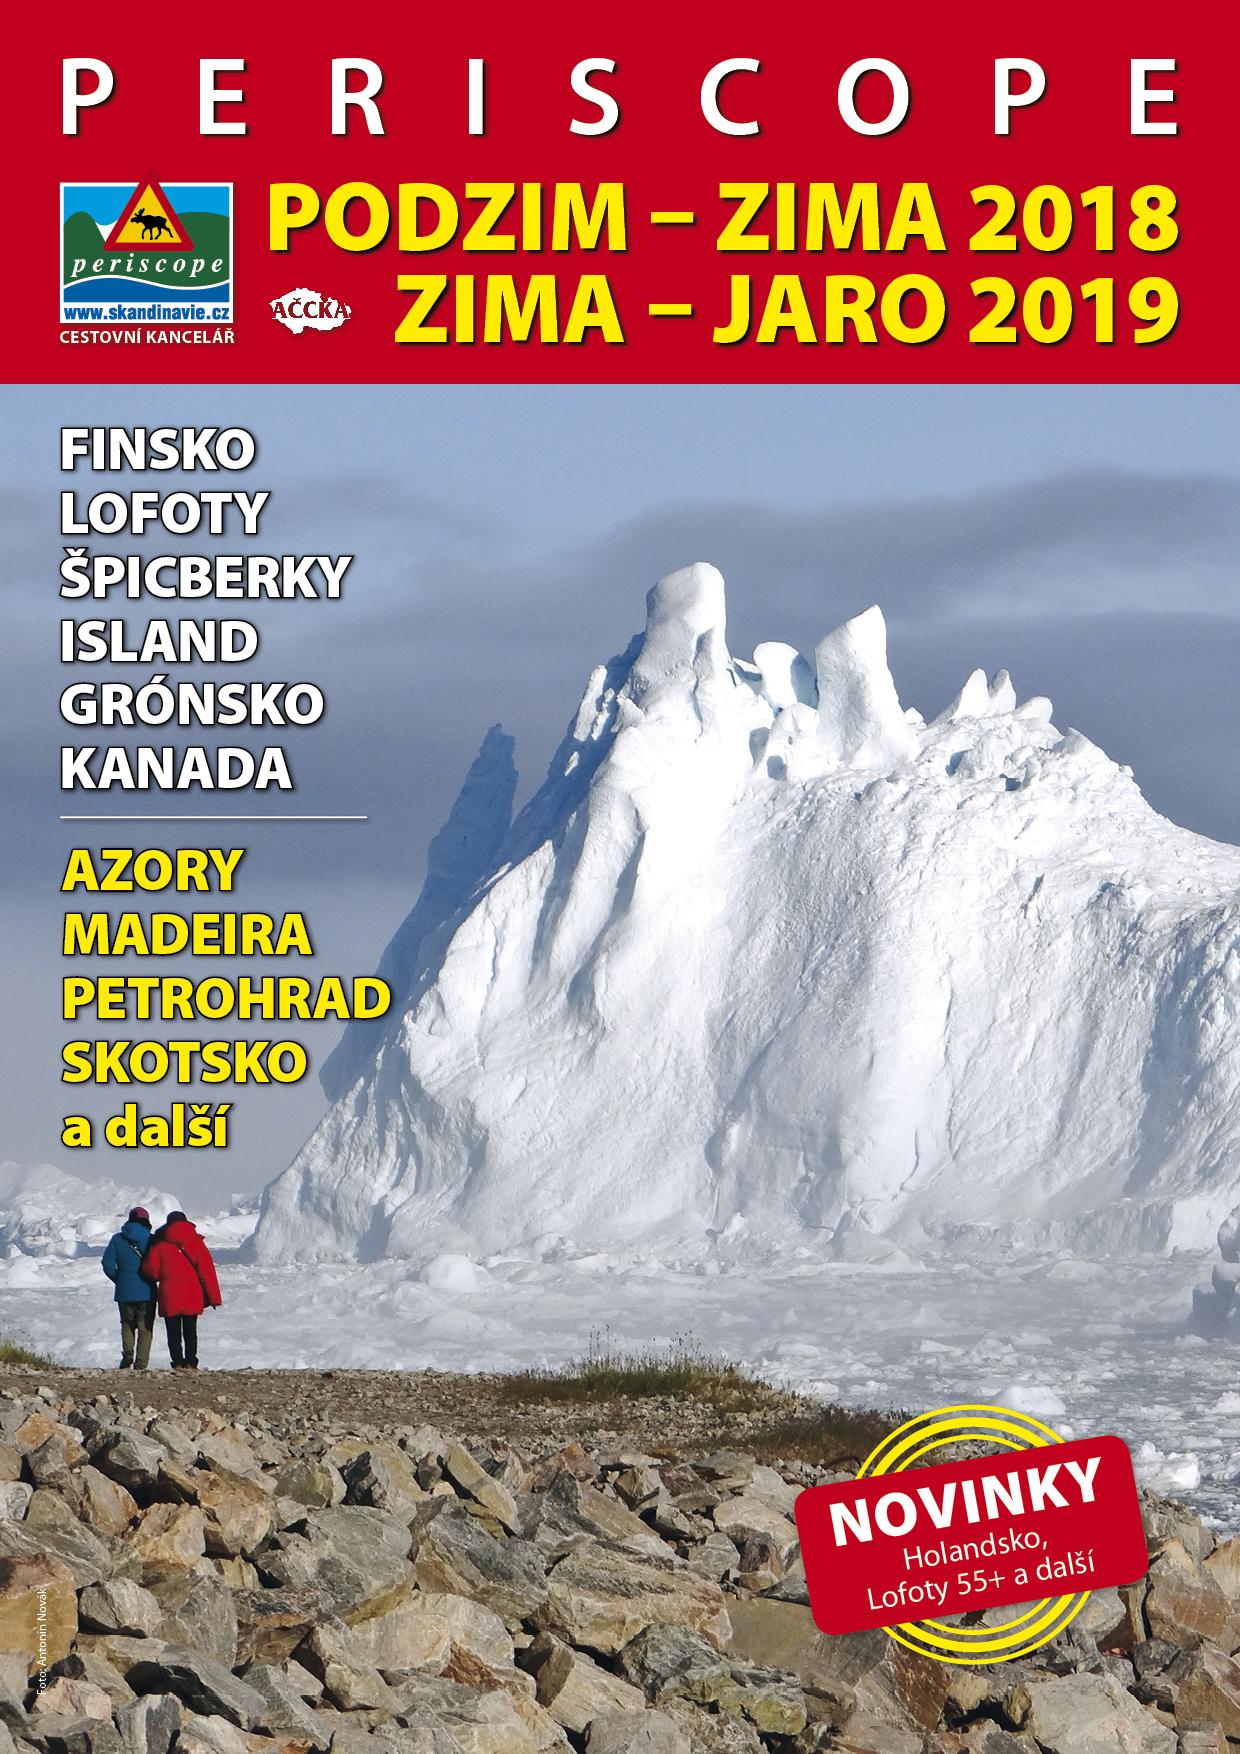 Redakce - Infoscope - zkatalogu / katalog podzim zima jaro 2018 2019